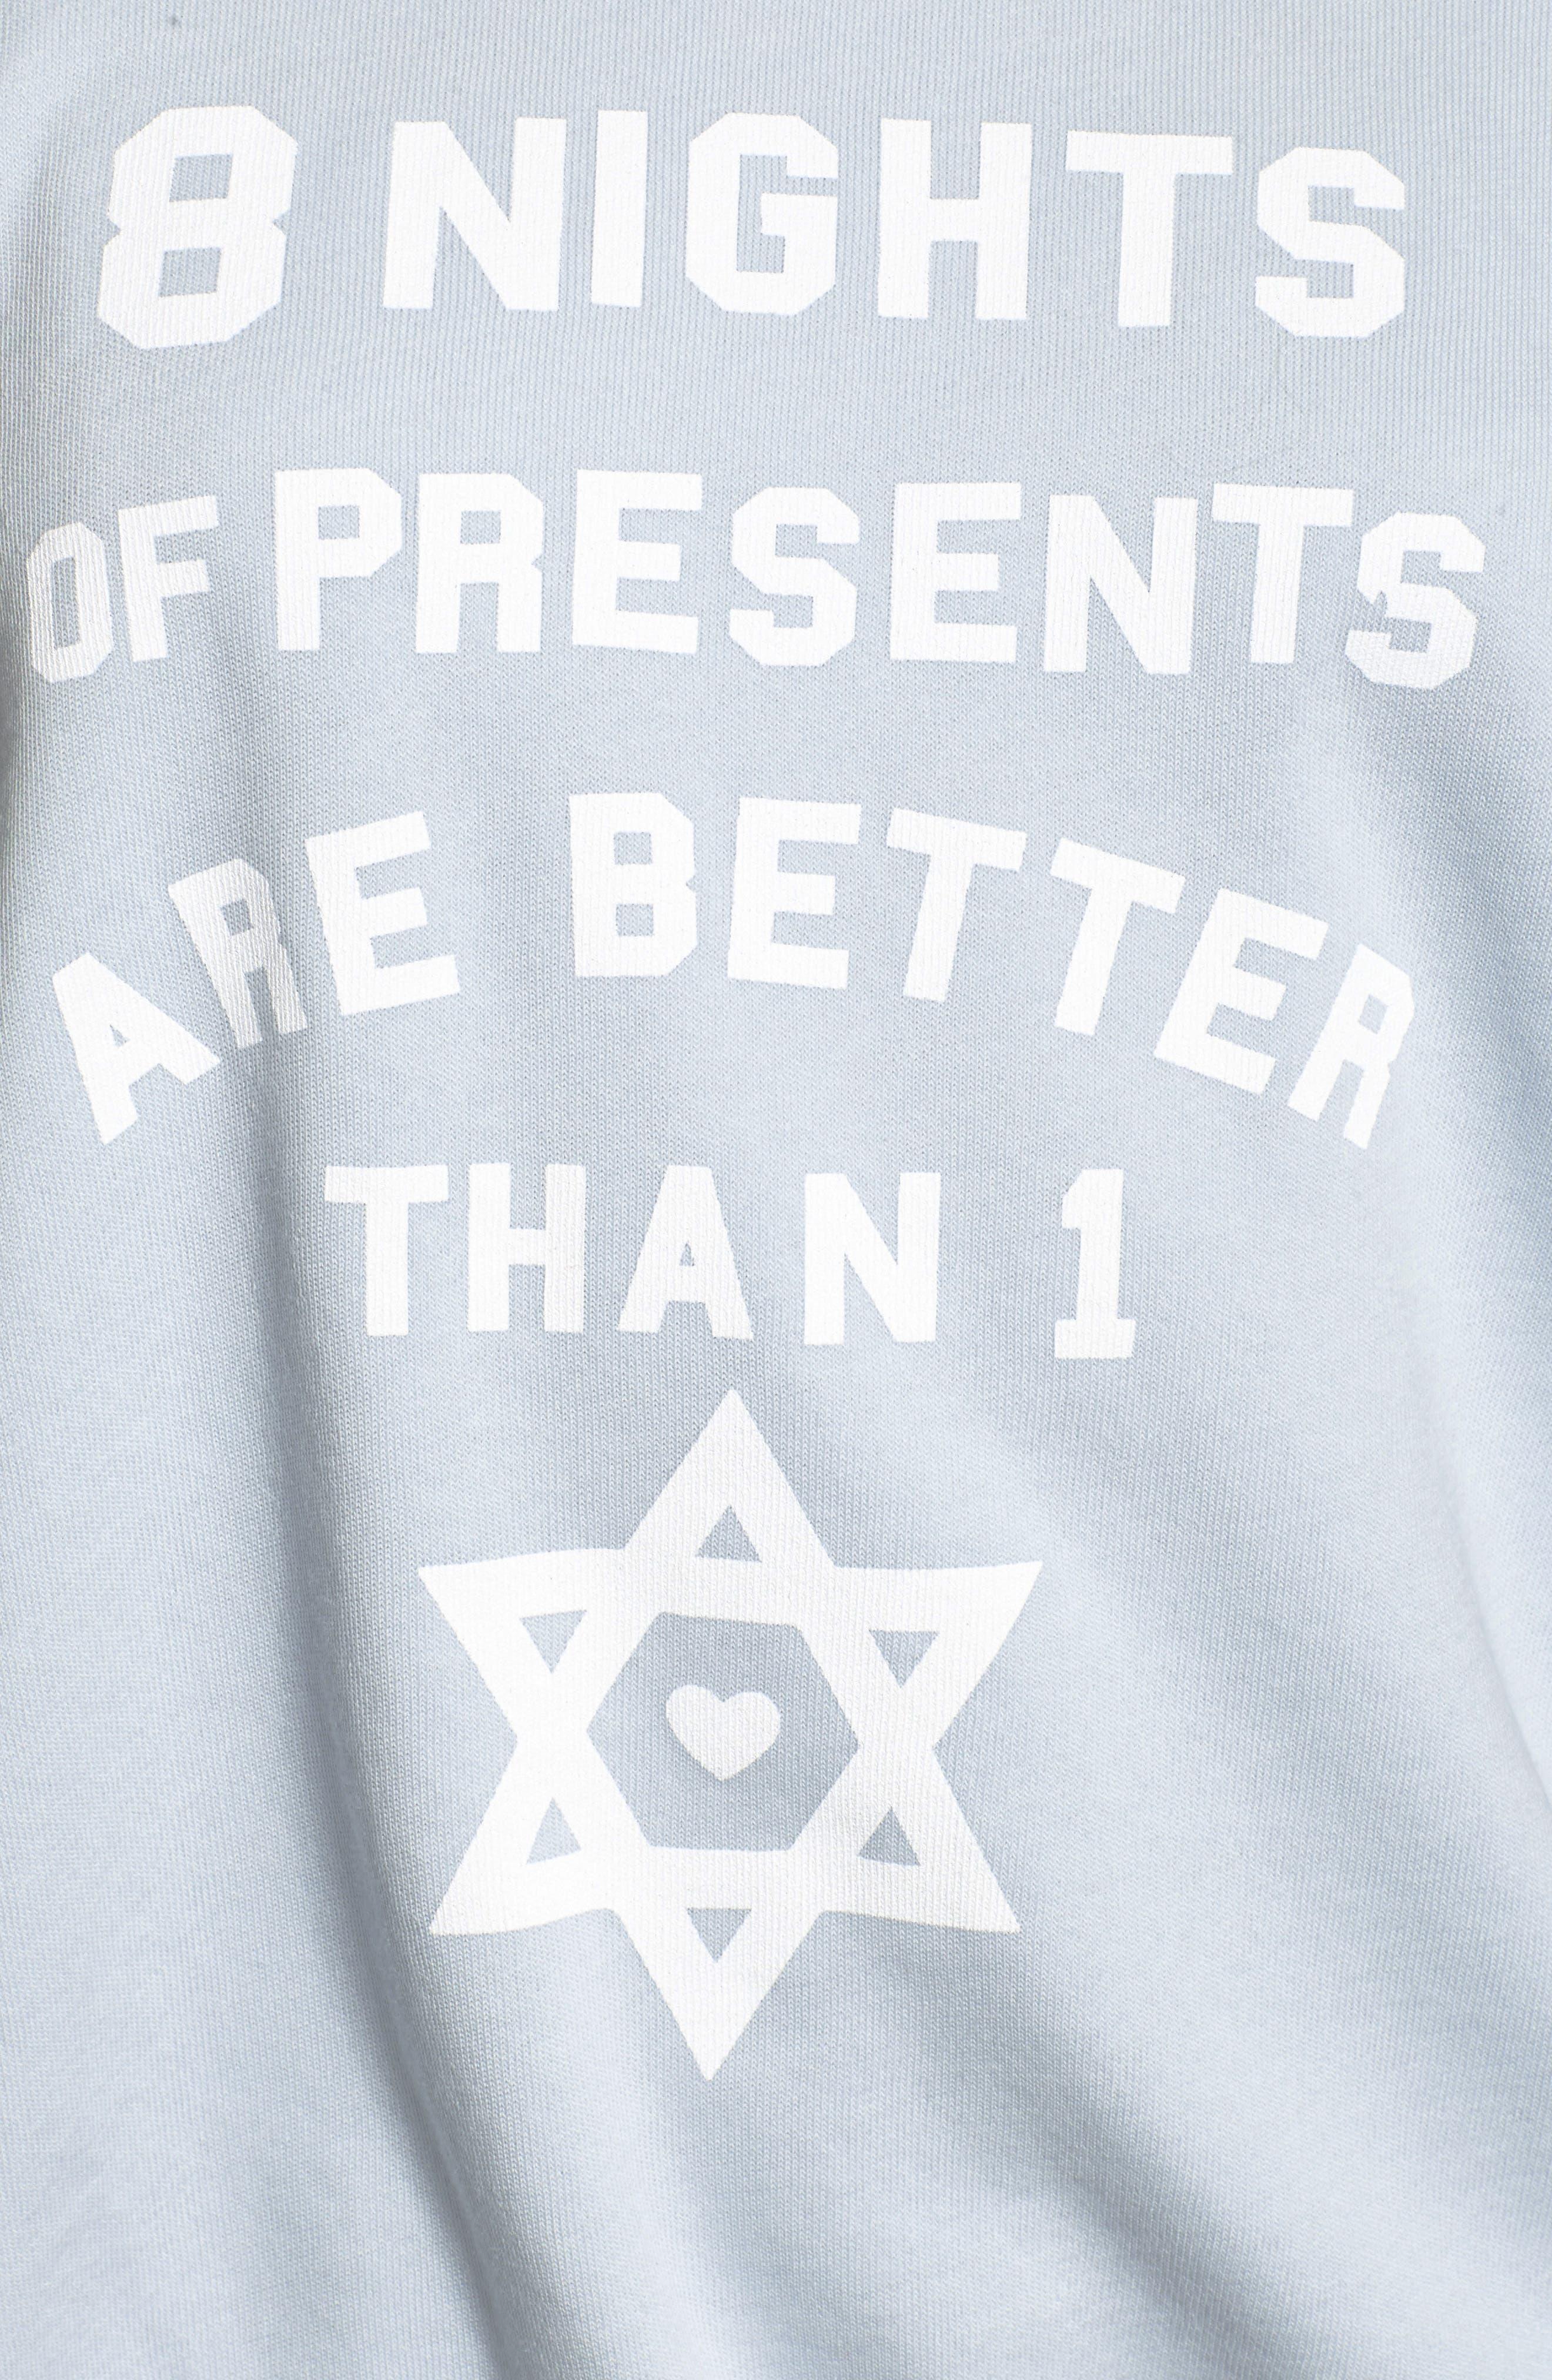 Eight Nights of Presents Hanukkah Sweater,                             Alternate thumbnail 5, color,                             401